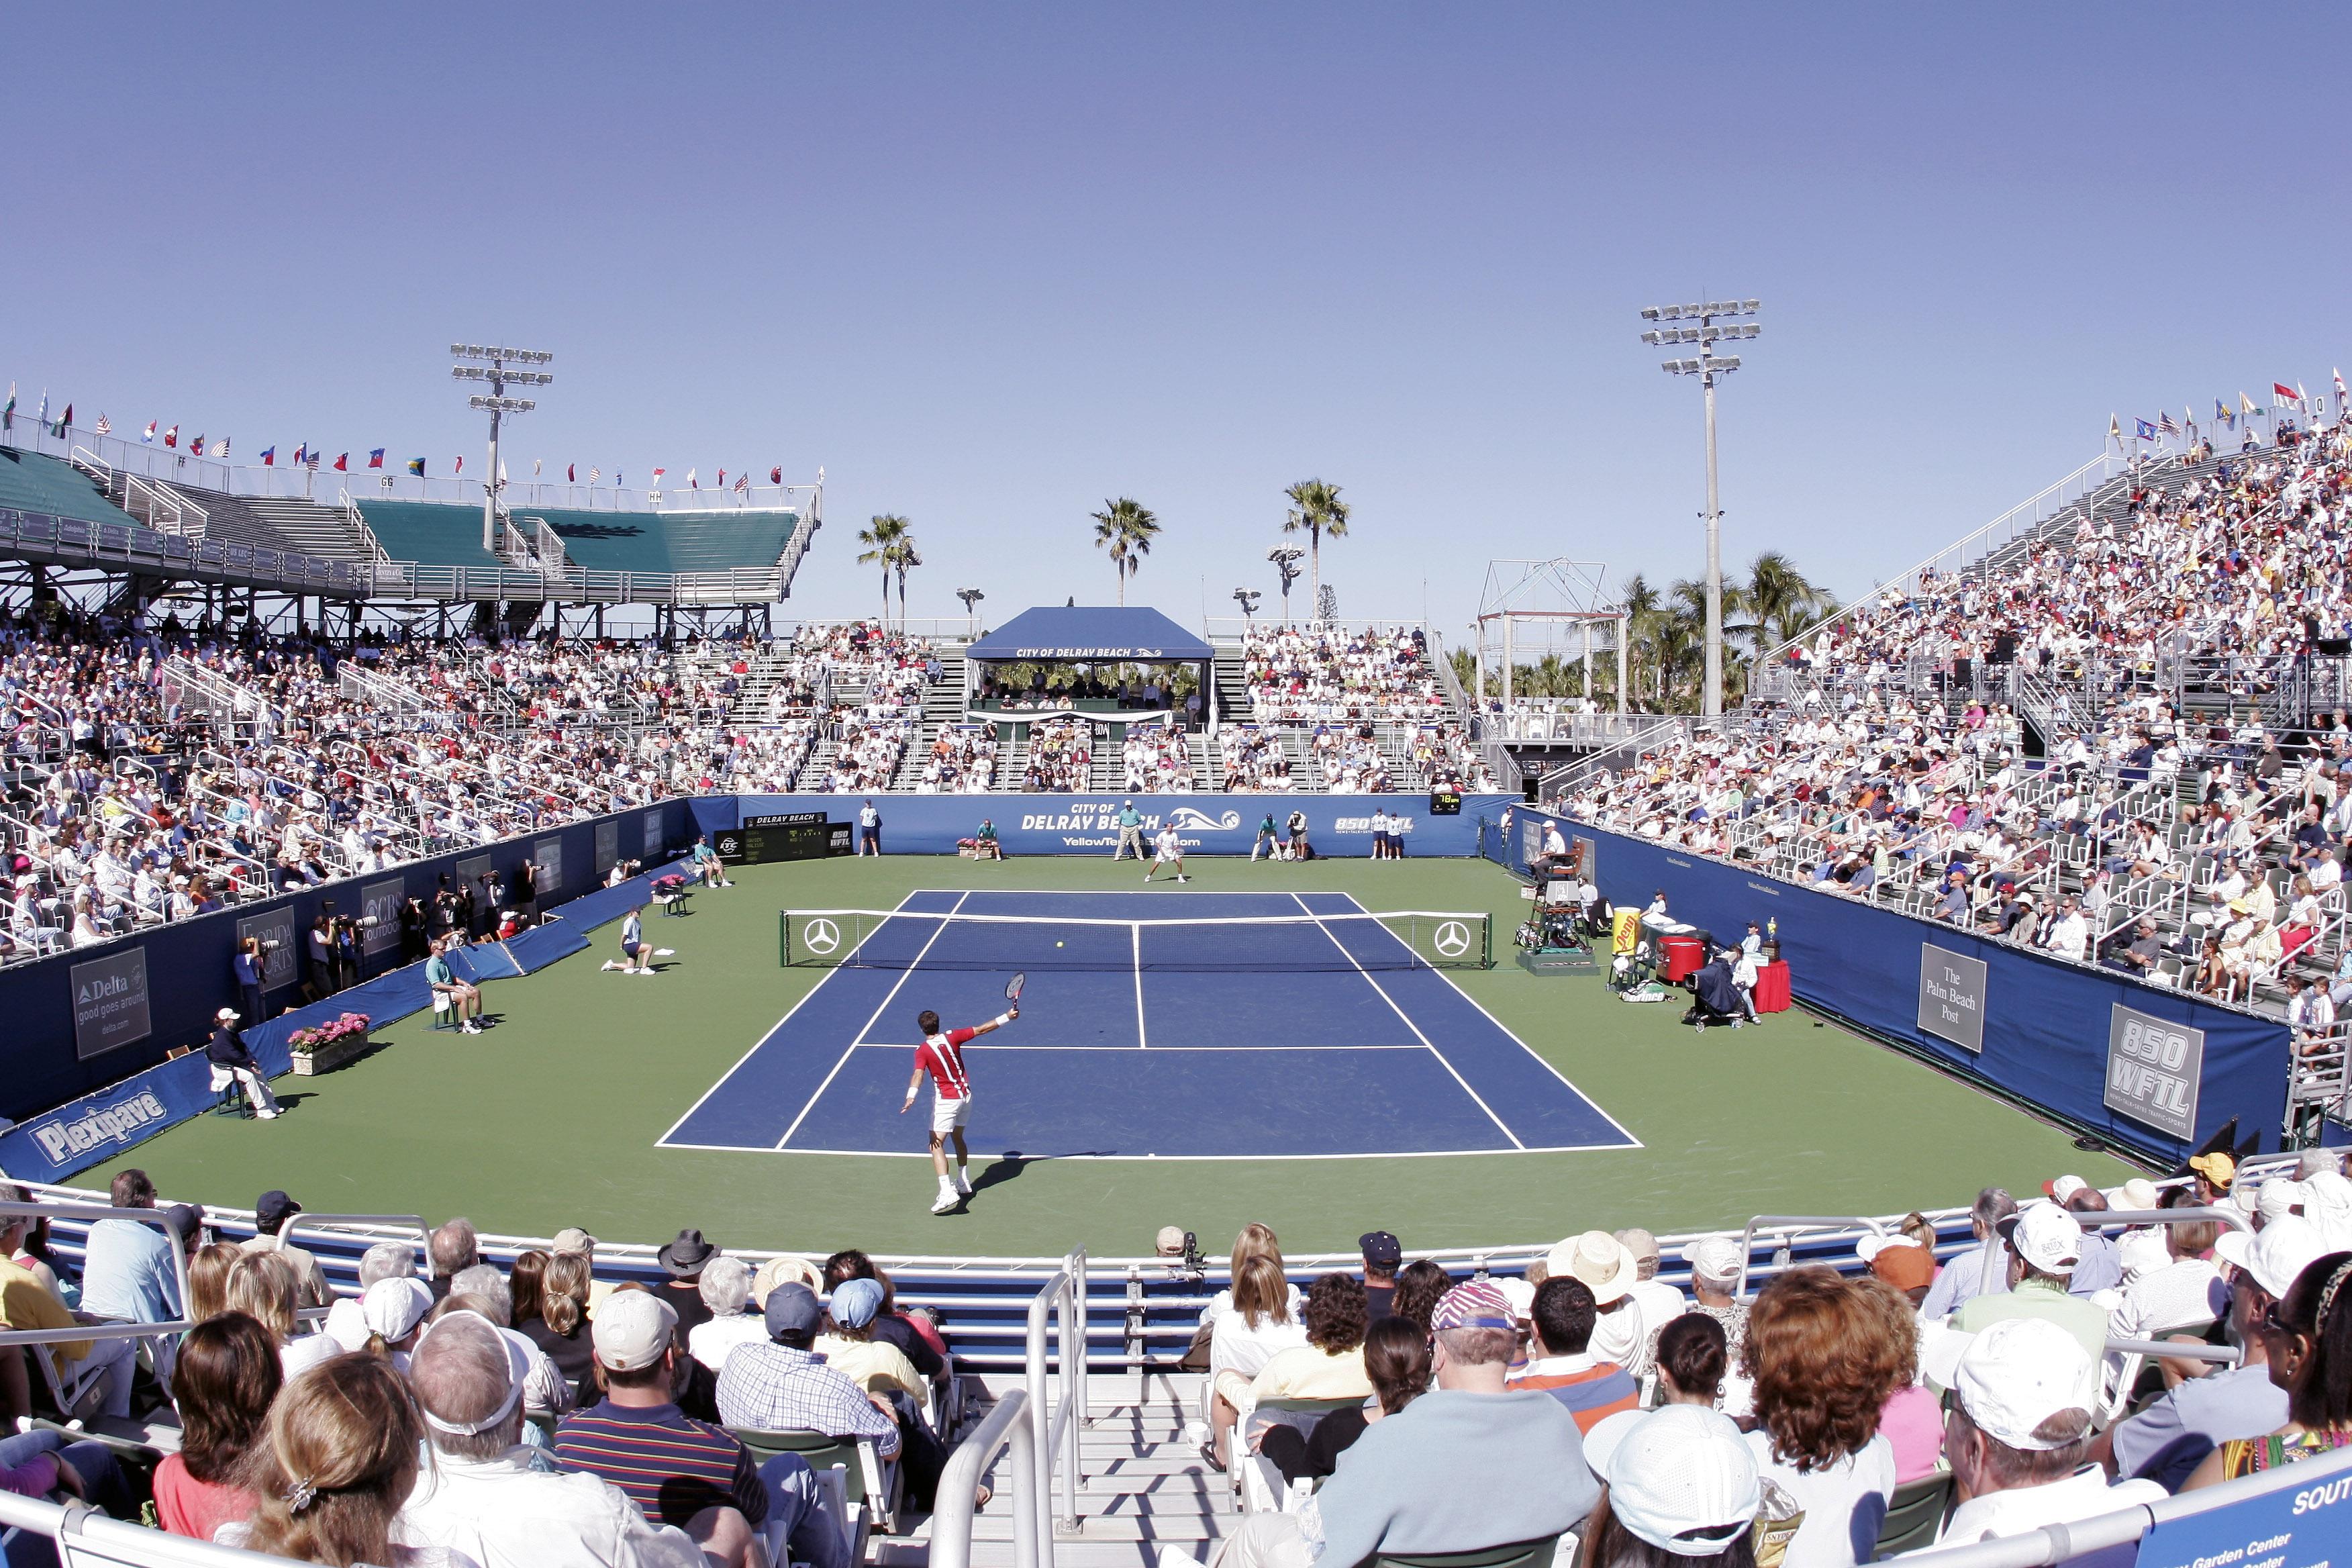 Delray Beach Tennis